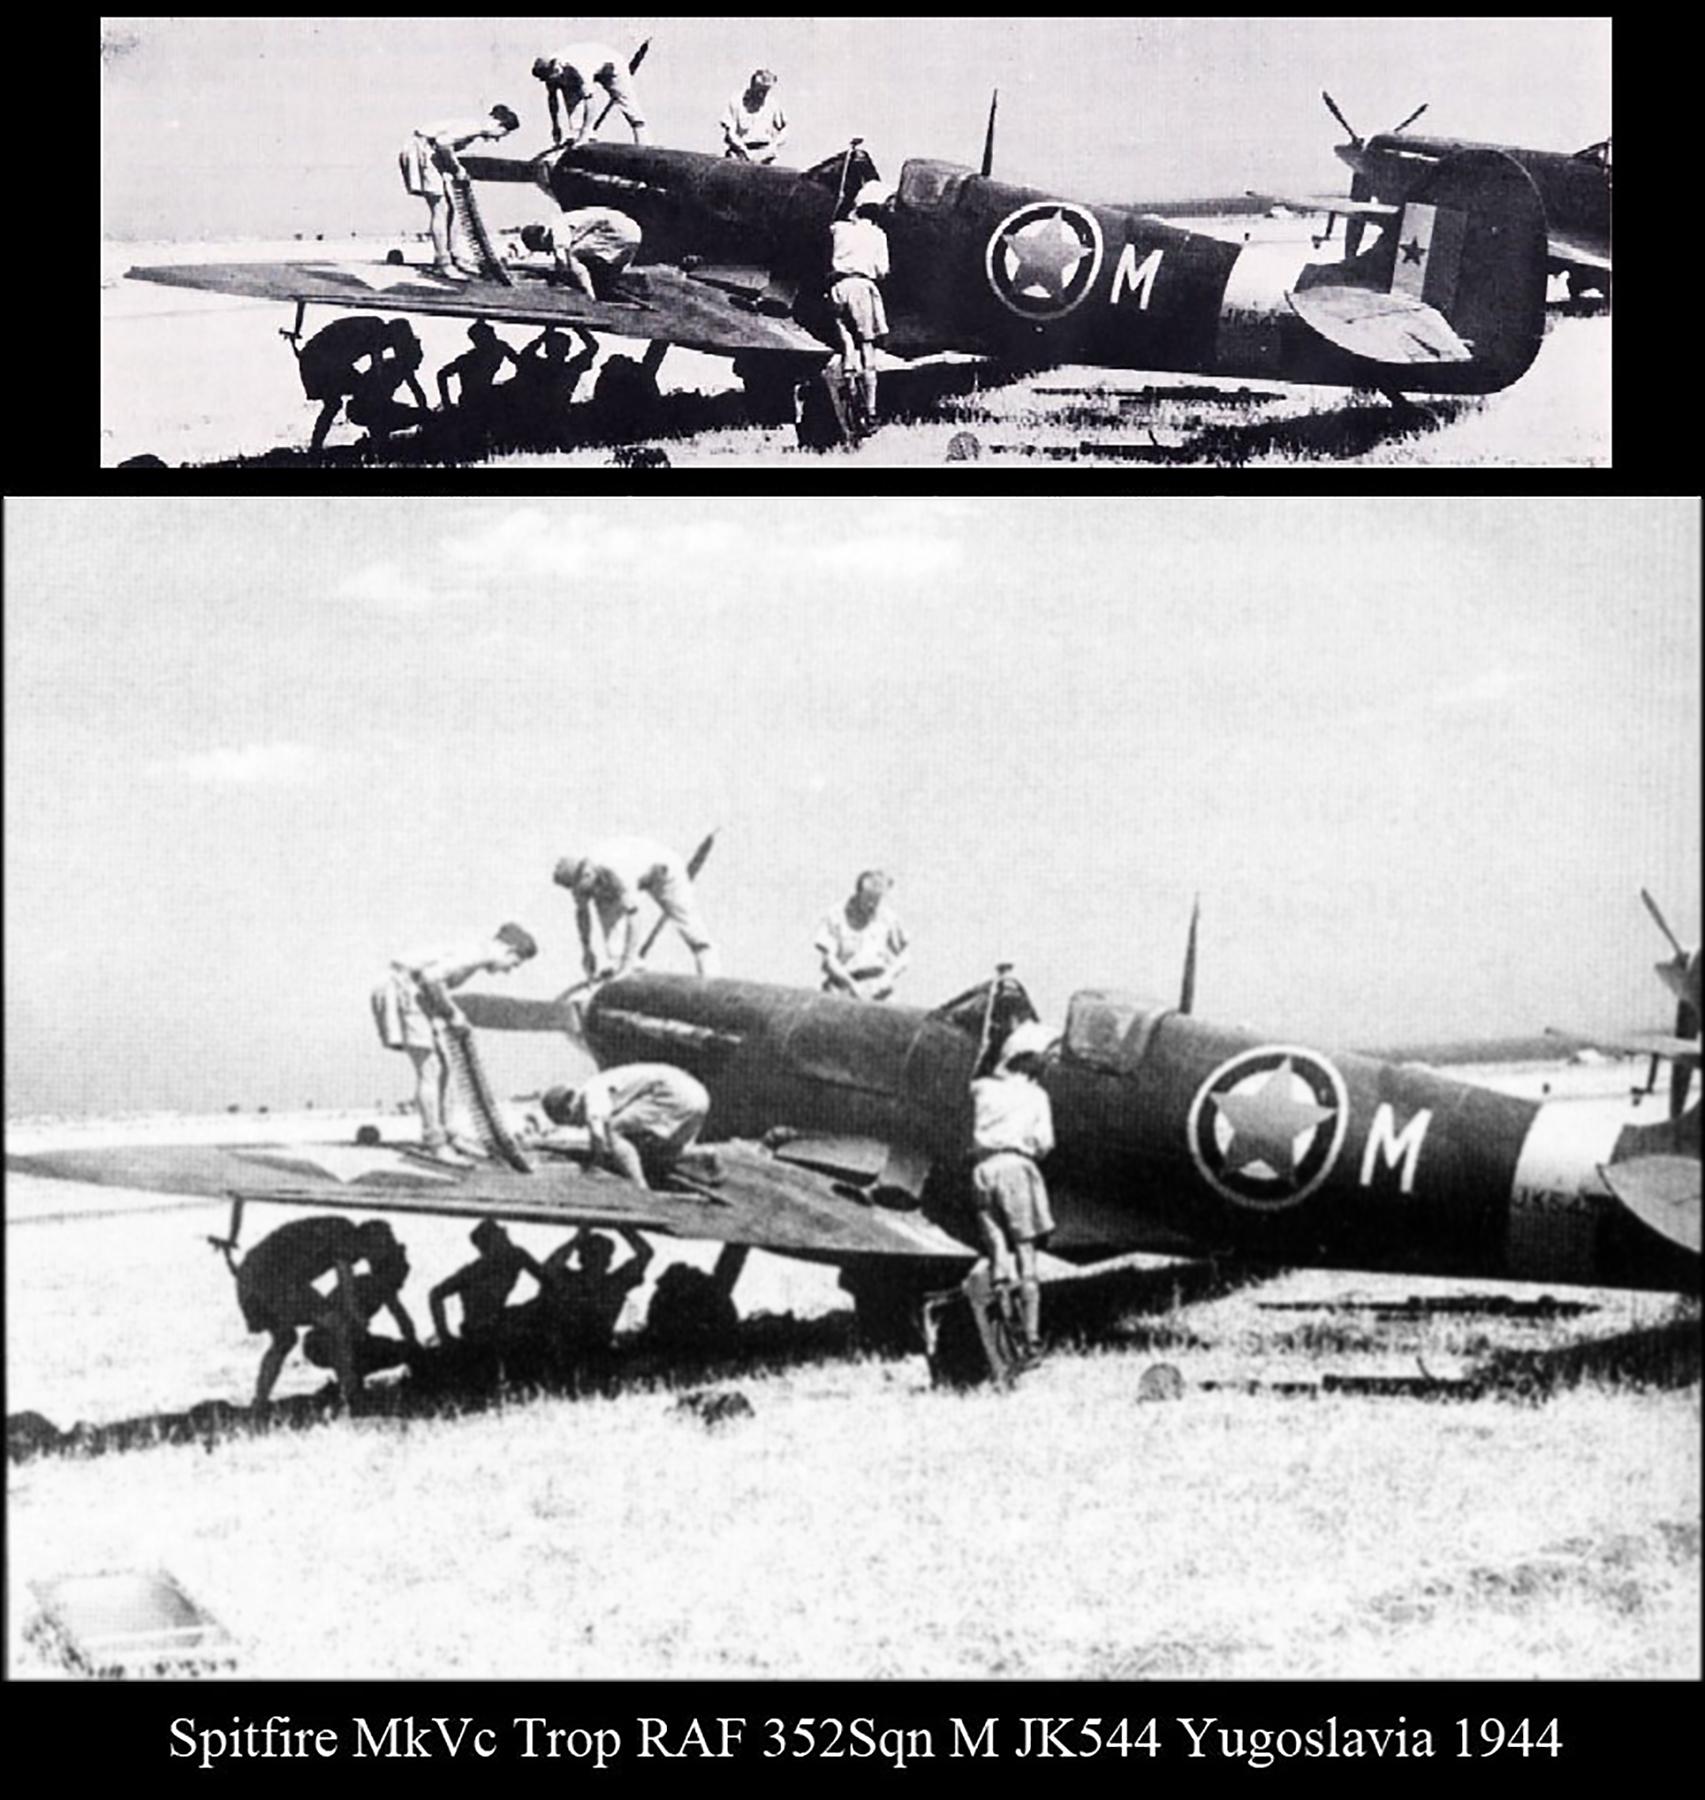 Spitfire MkVcTrop RAF 352Sqn M JK544 Yugoslavia Aug 1944 01